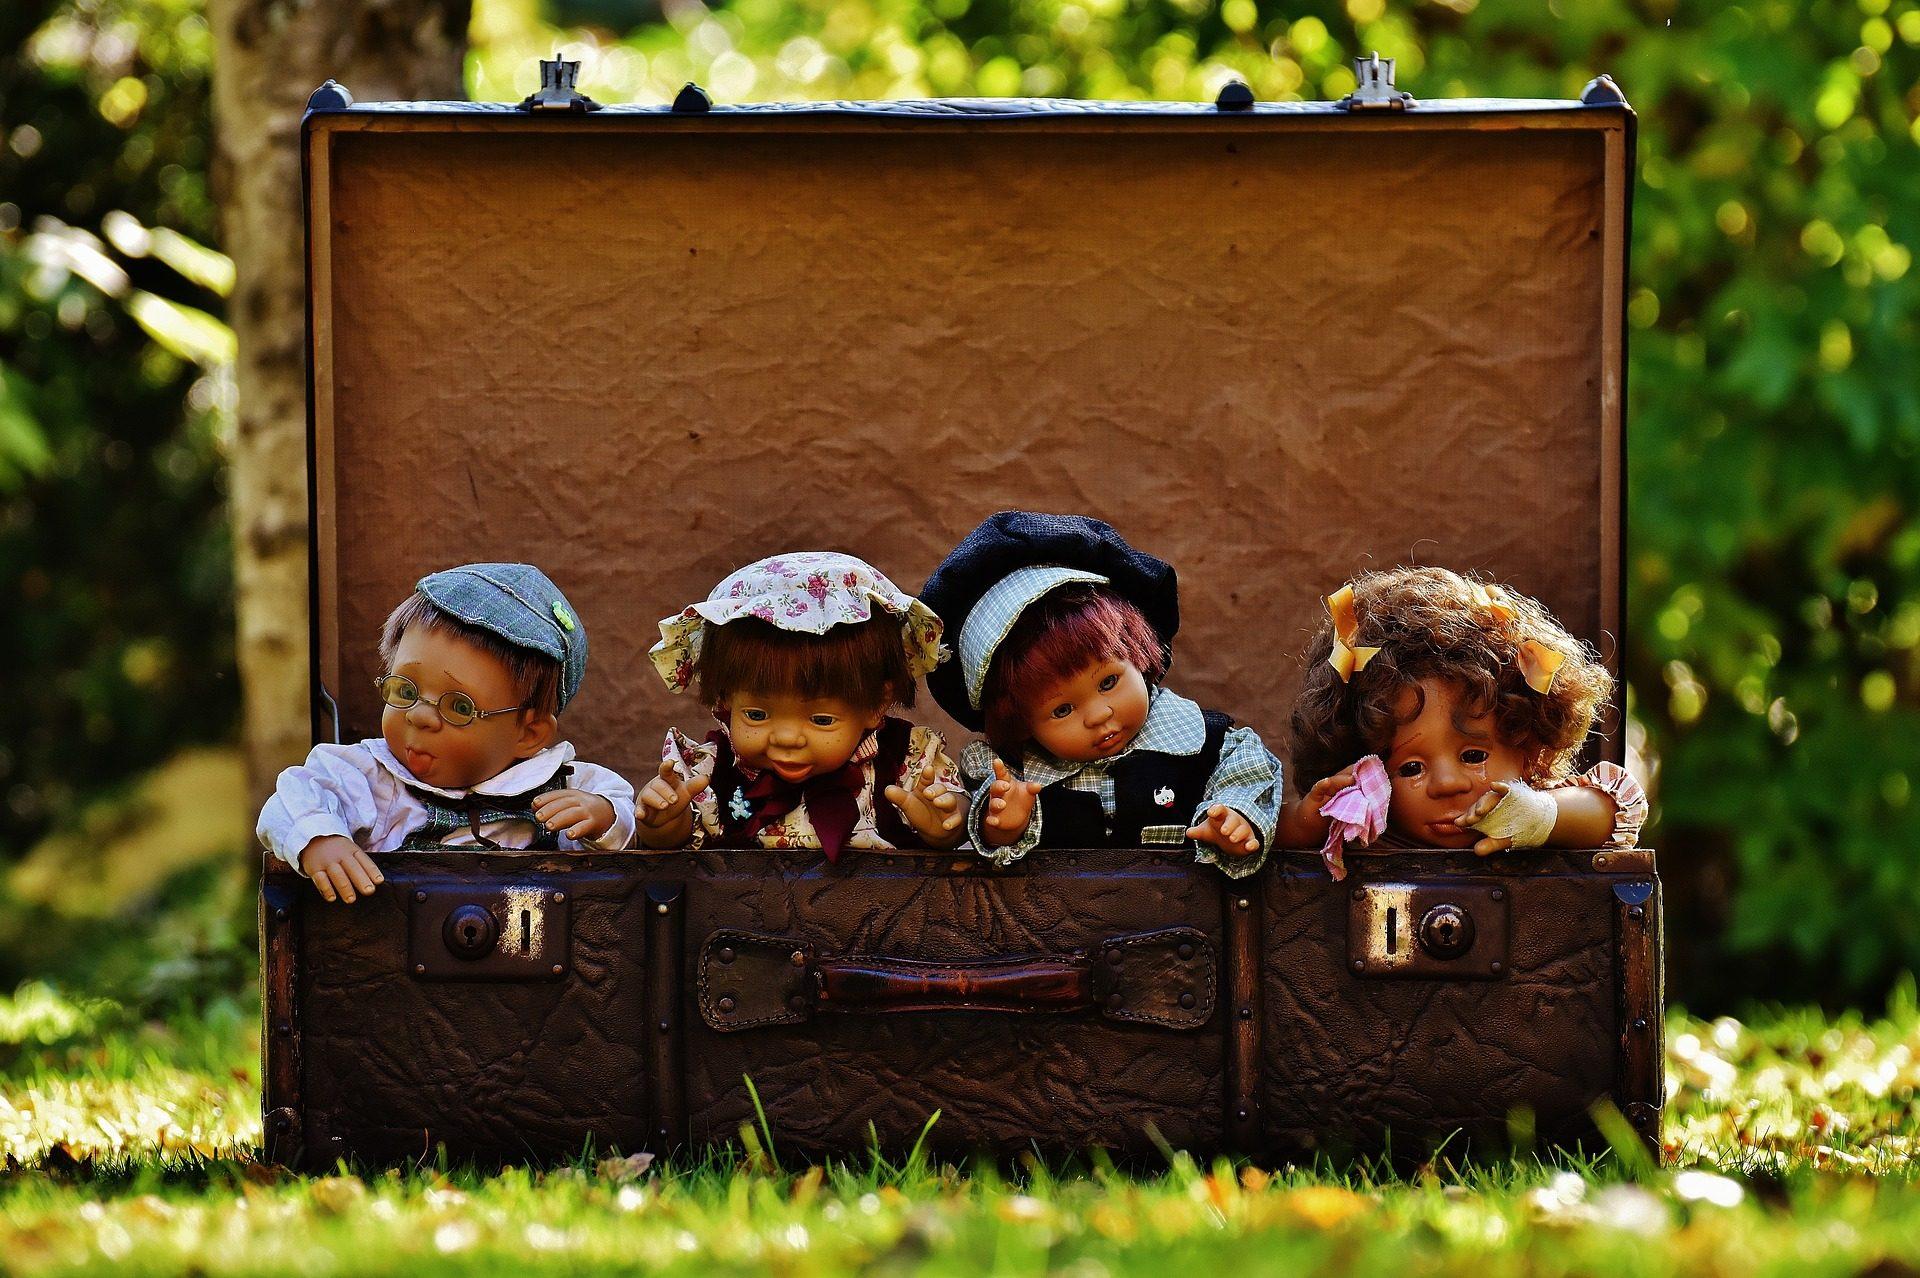 dolls-1706173_1920.jpg